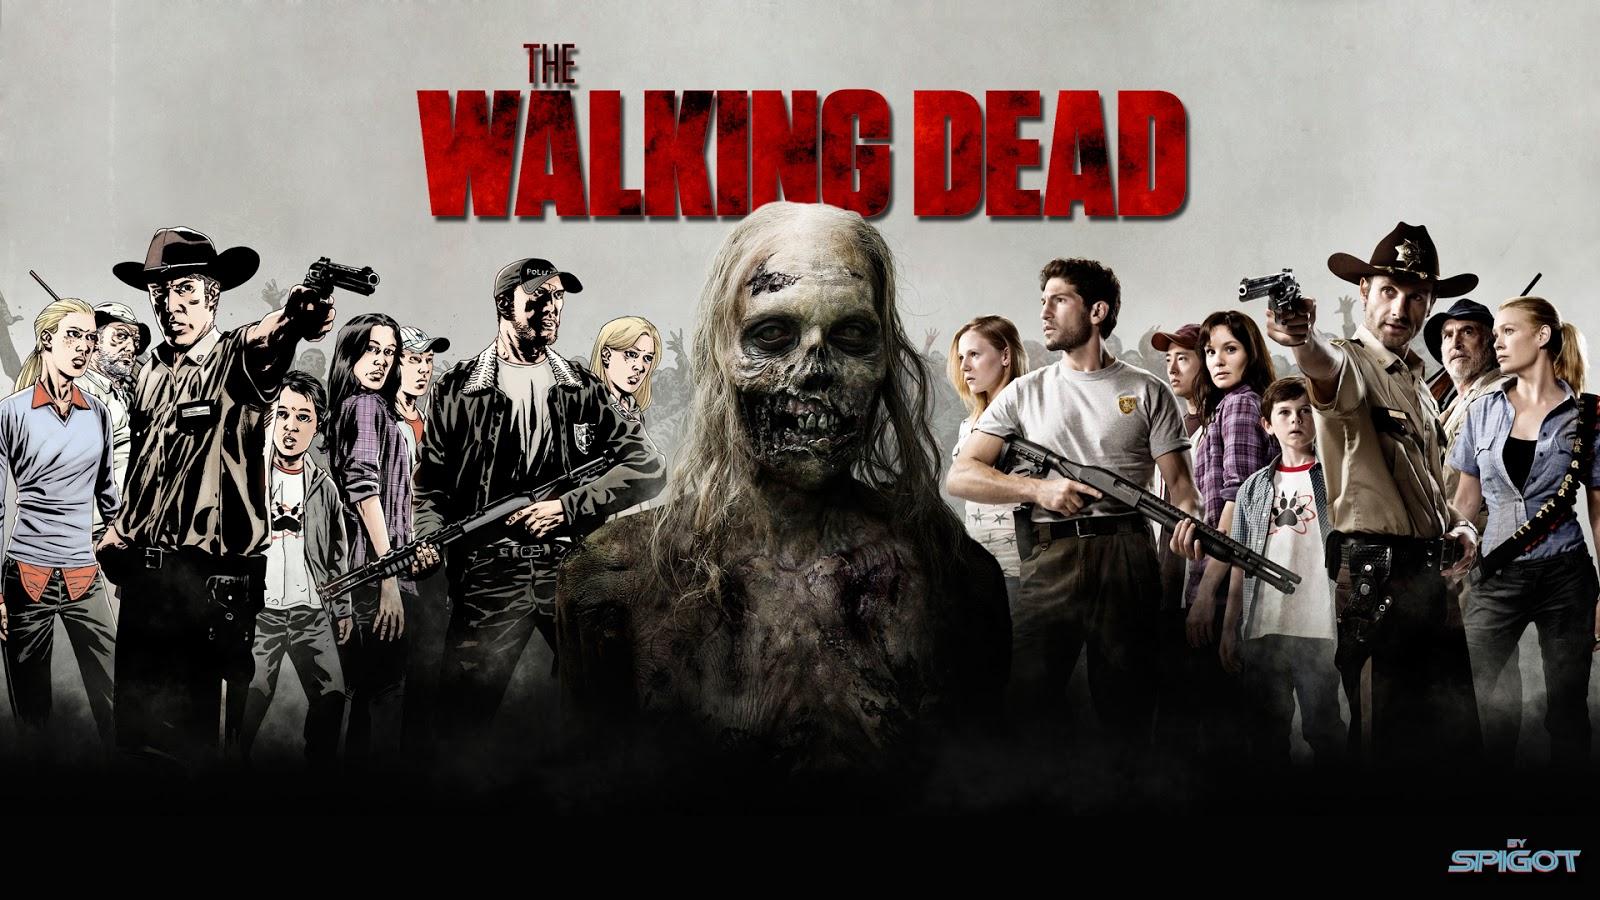 Free Download The Walking Dead Season 6 Wallpapers Digitalhintnet